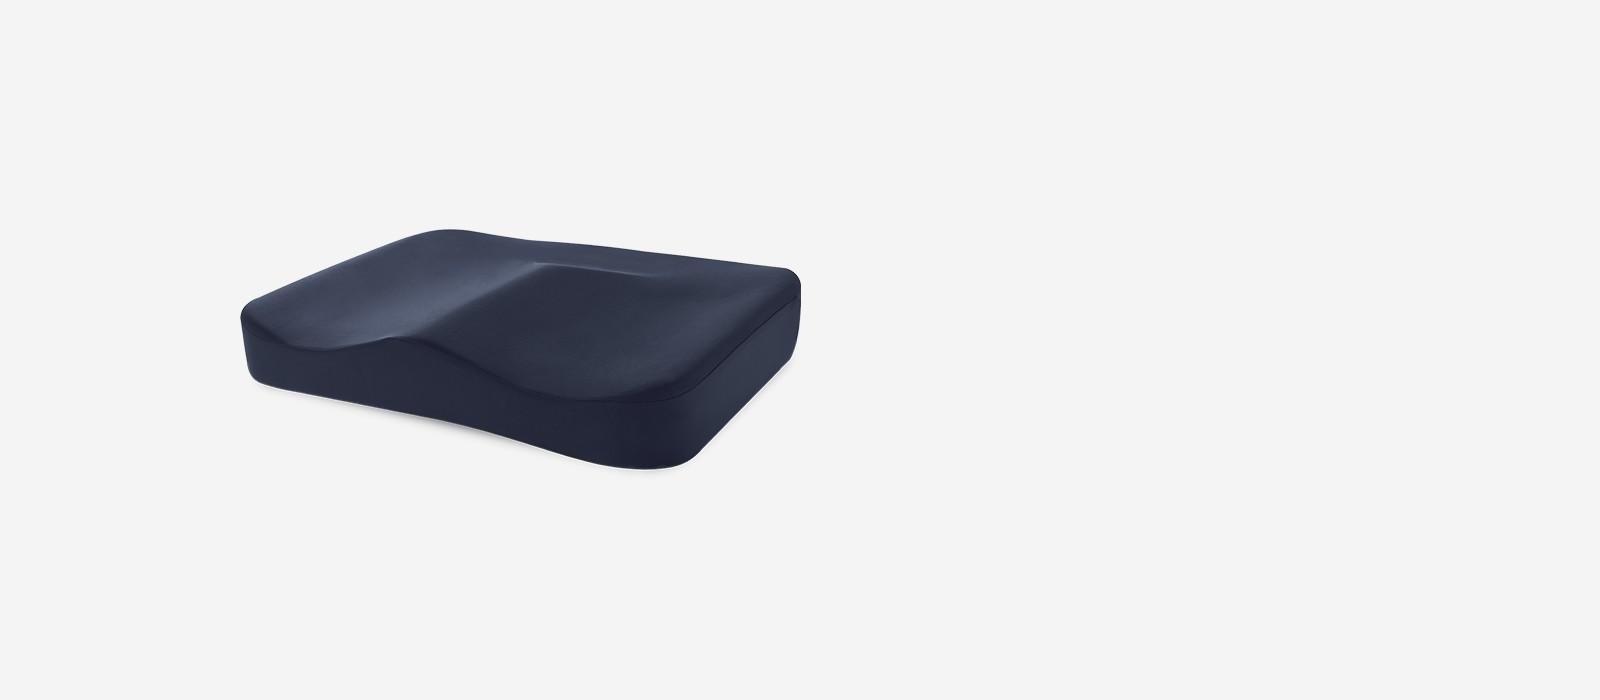 Incroyable Seat Cushion   Home U0026 Office | Tempur Pedic ?